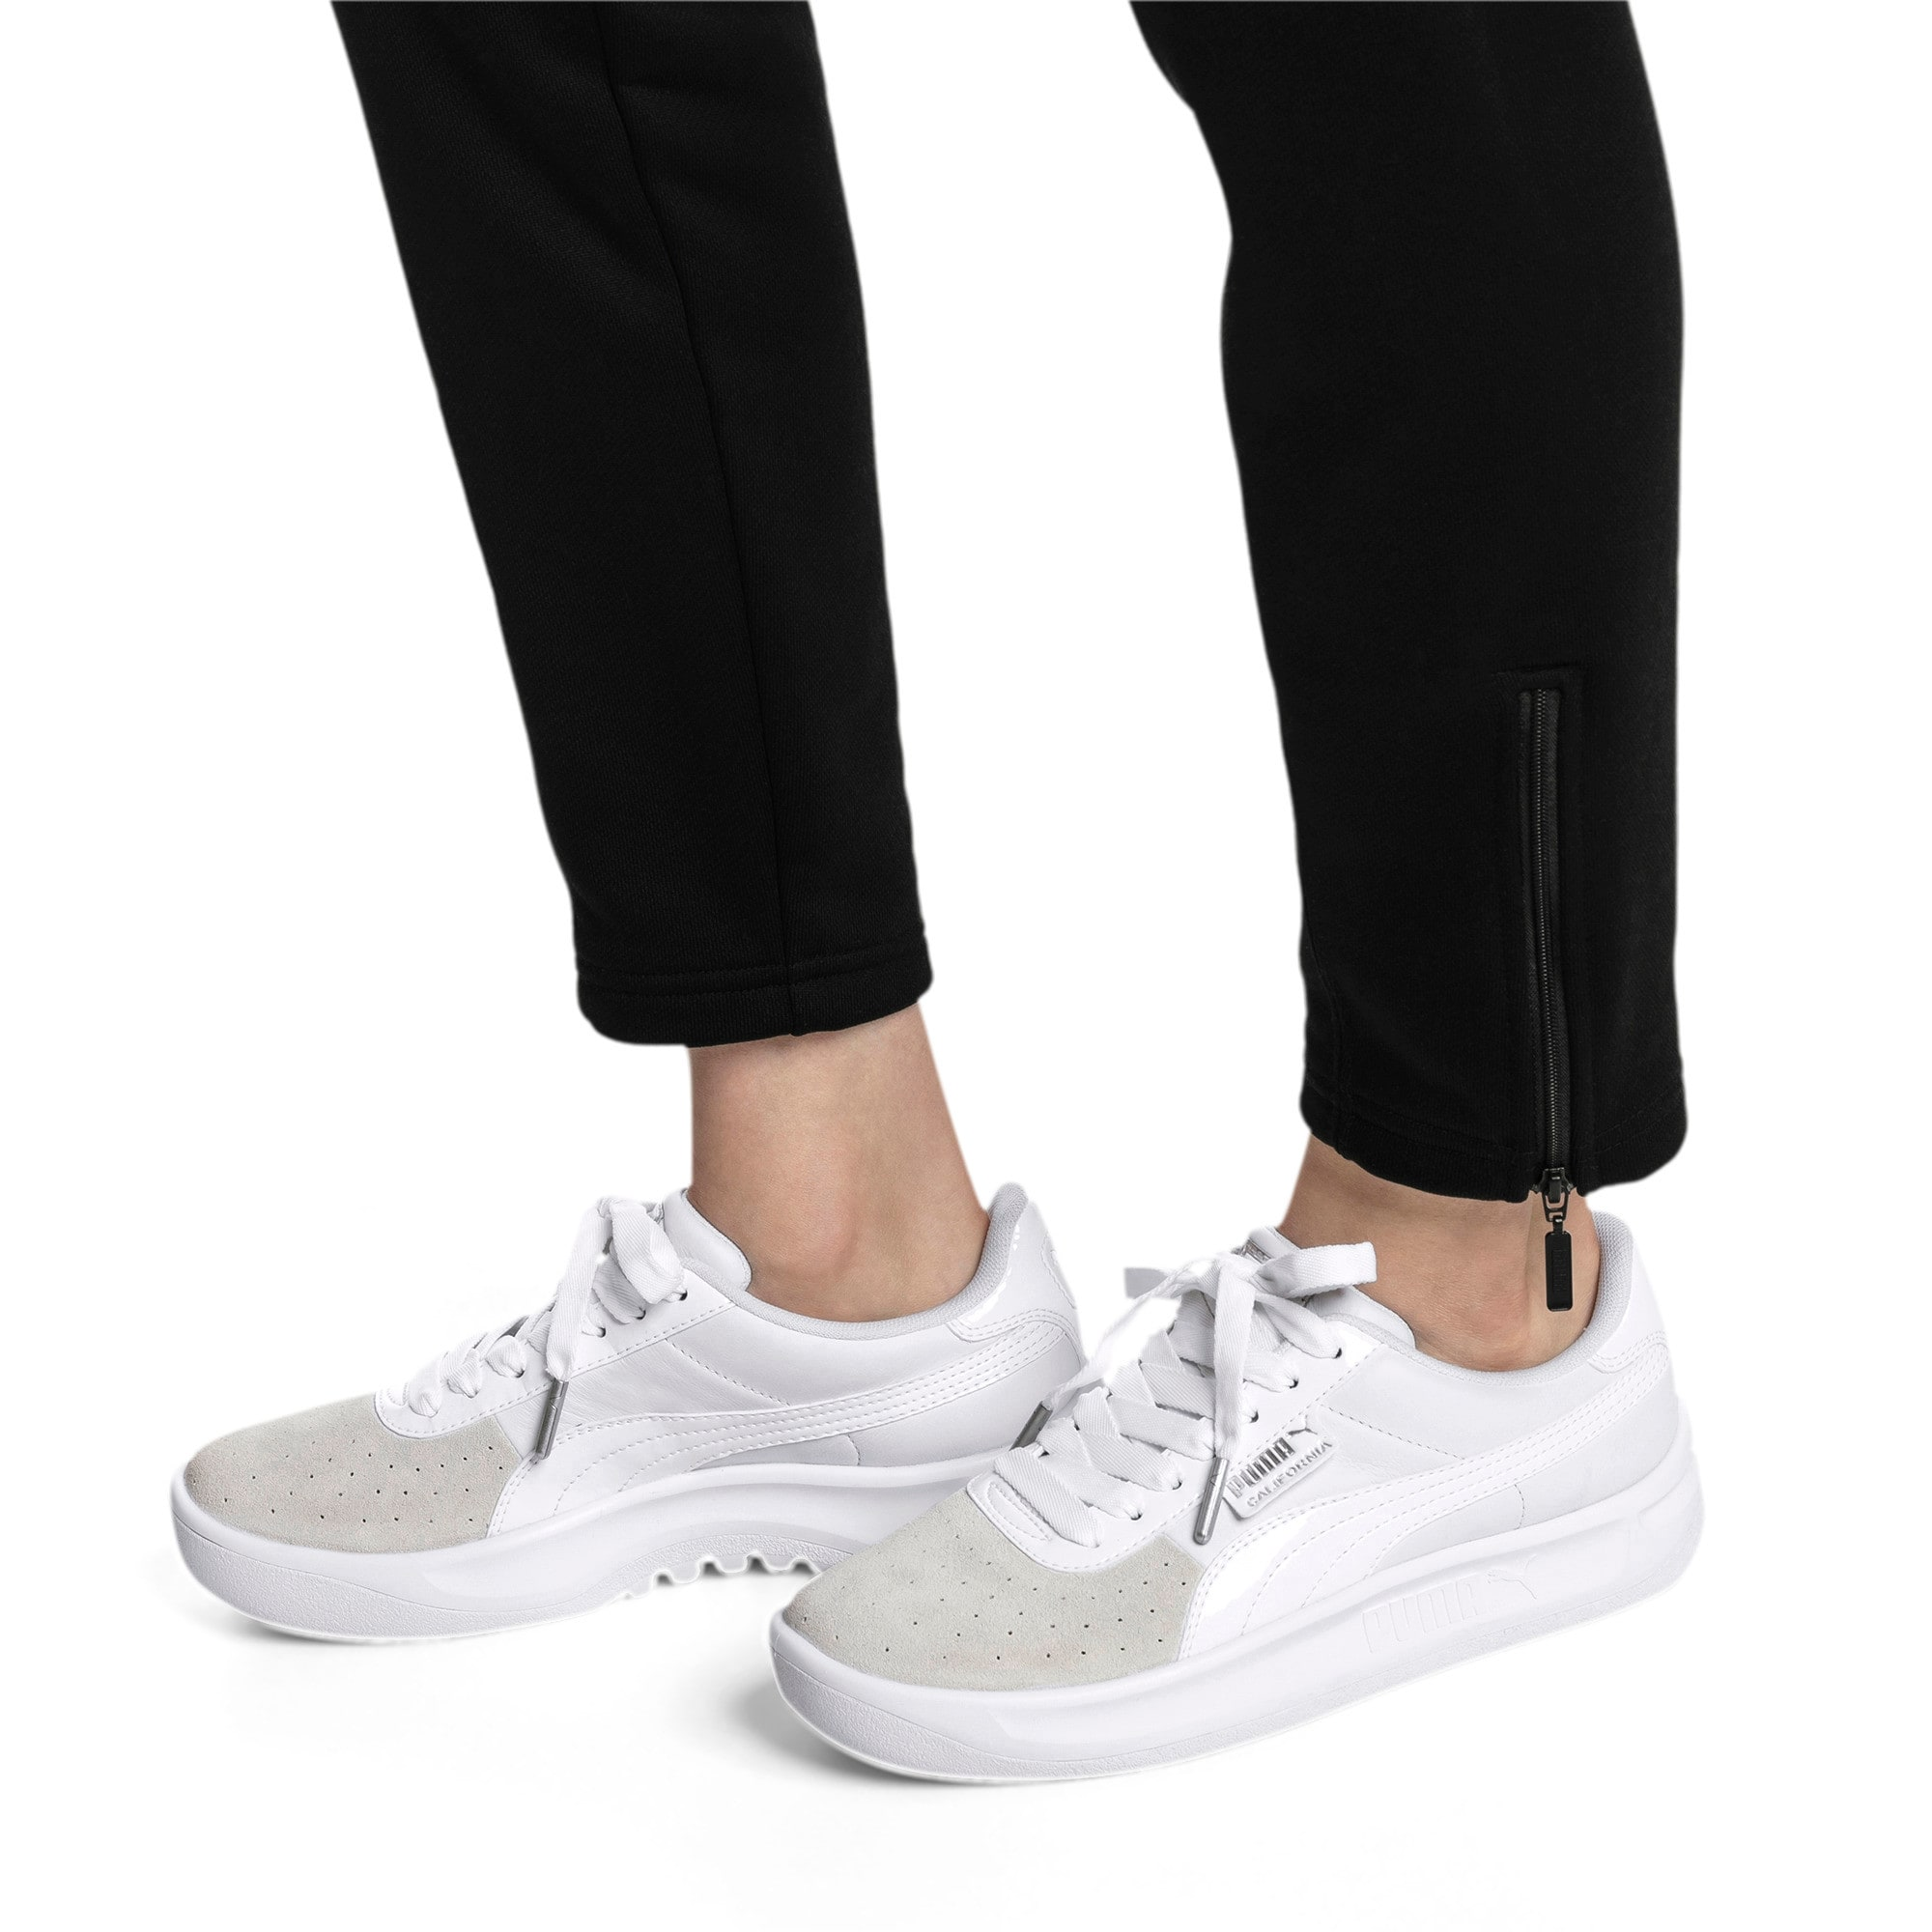 Thumbnail 2 of California Monochrome Women's Sneakers, Puma White-Puma Silver, medium